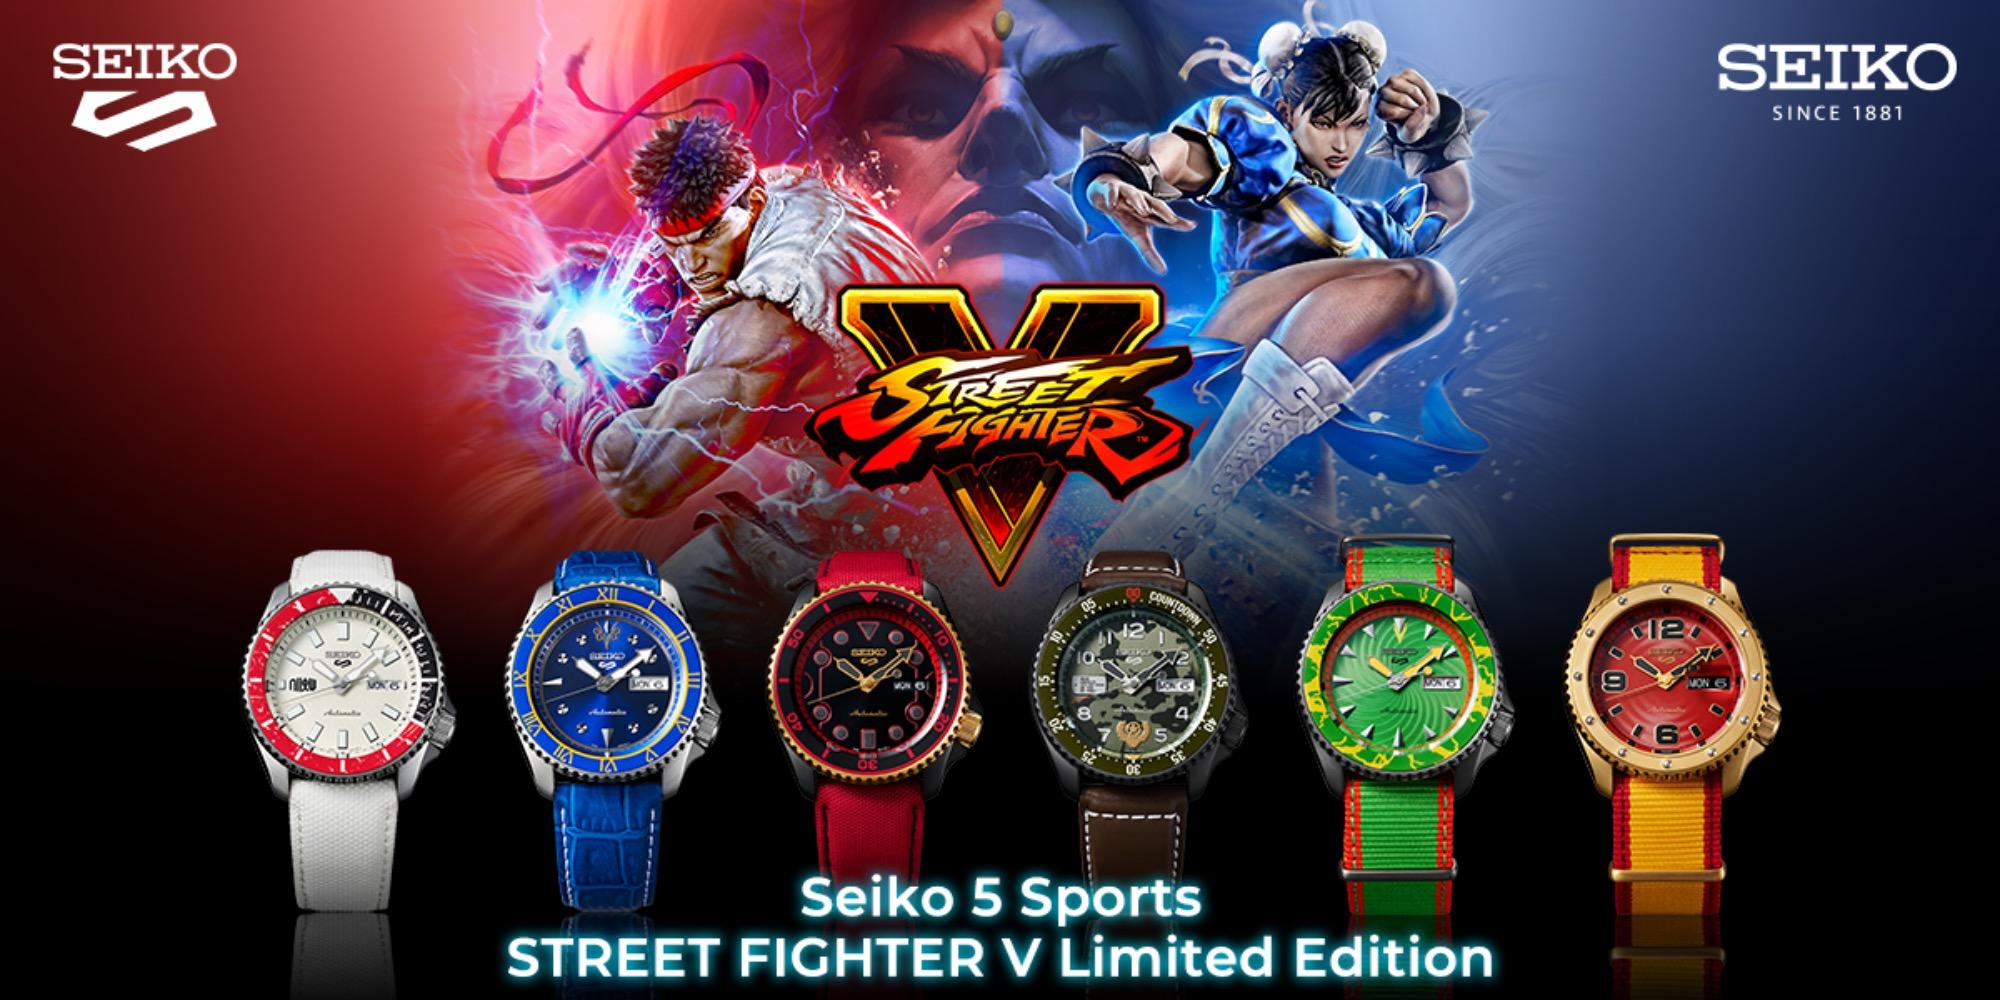 Seiko Street Fighter V